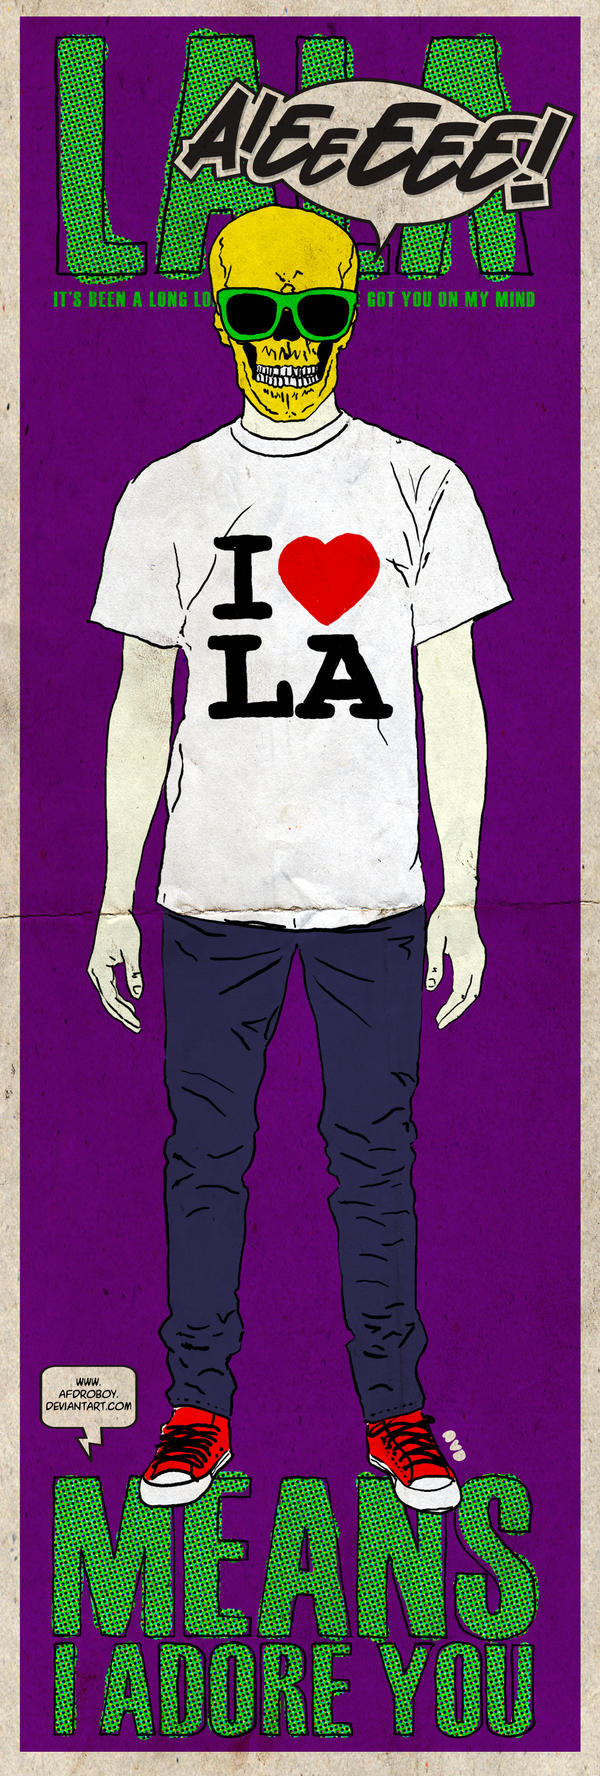 la la means i adore you by AFDROBOY